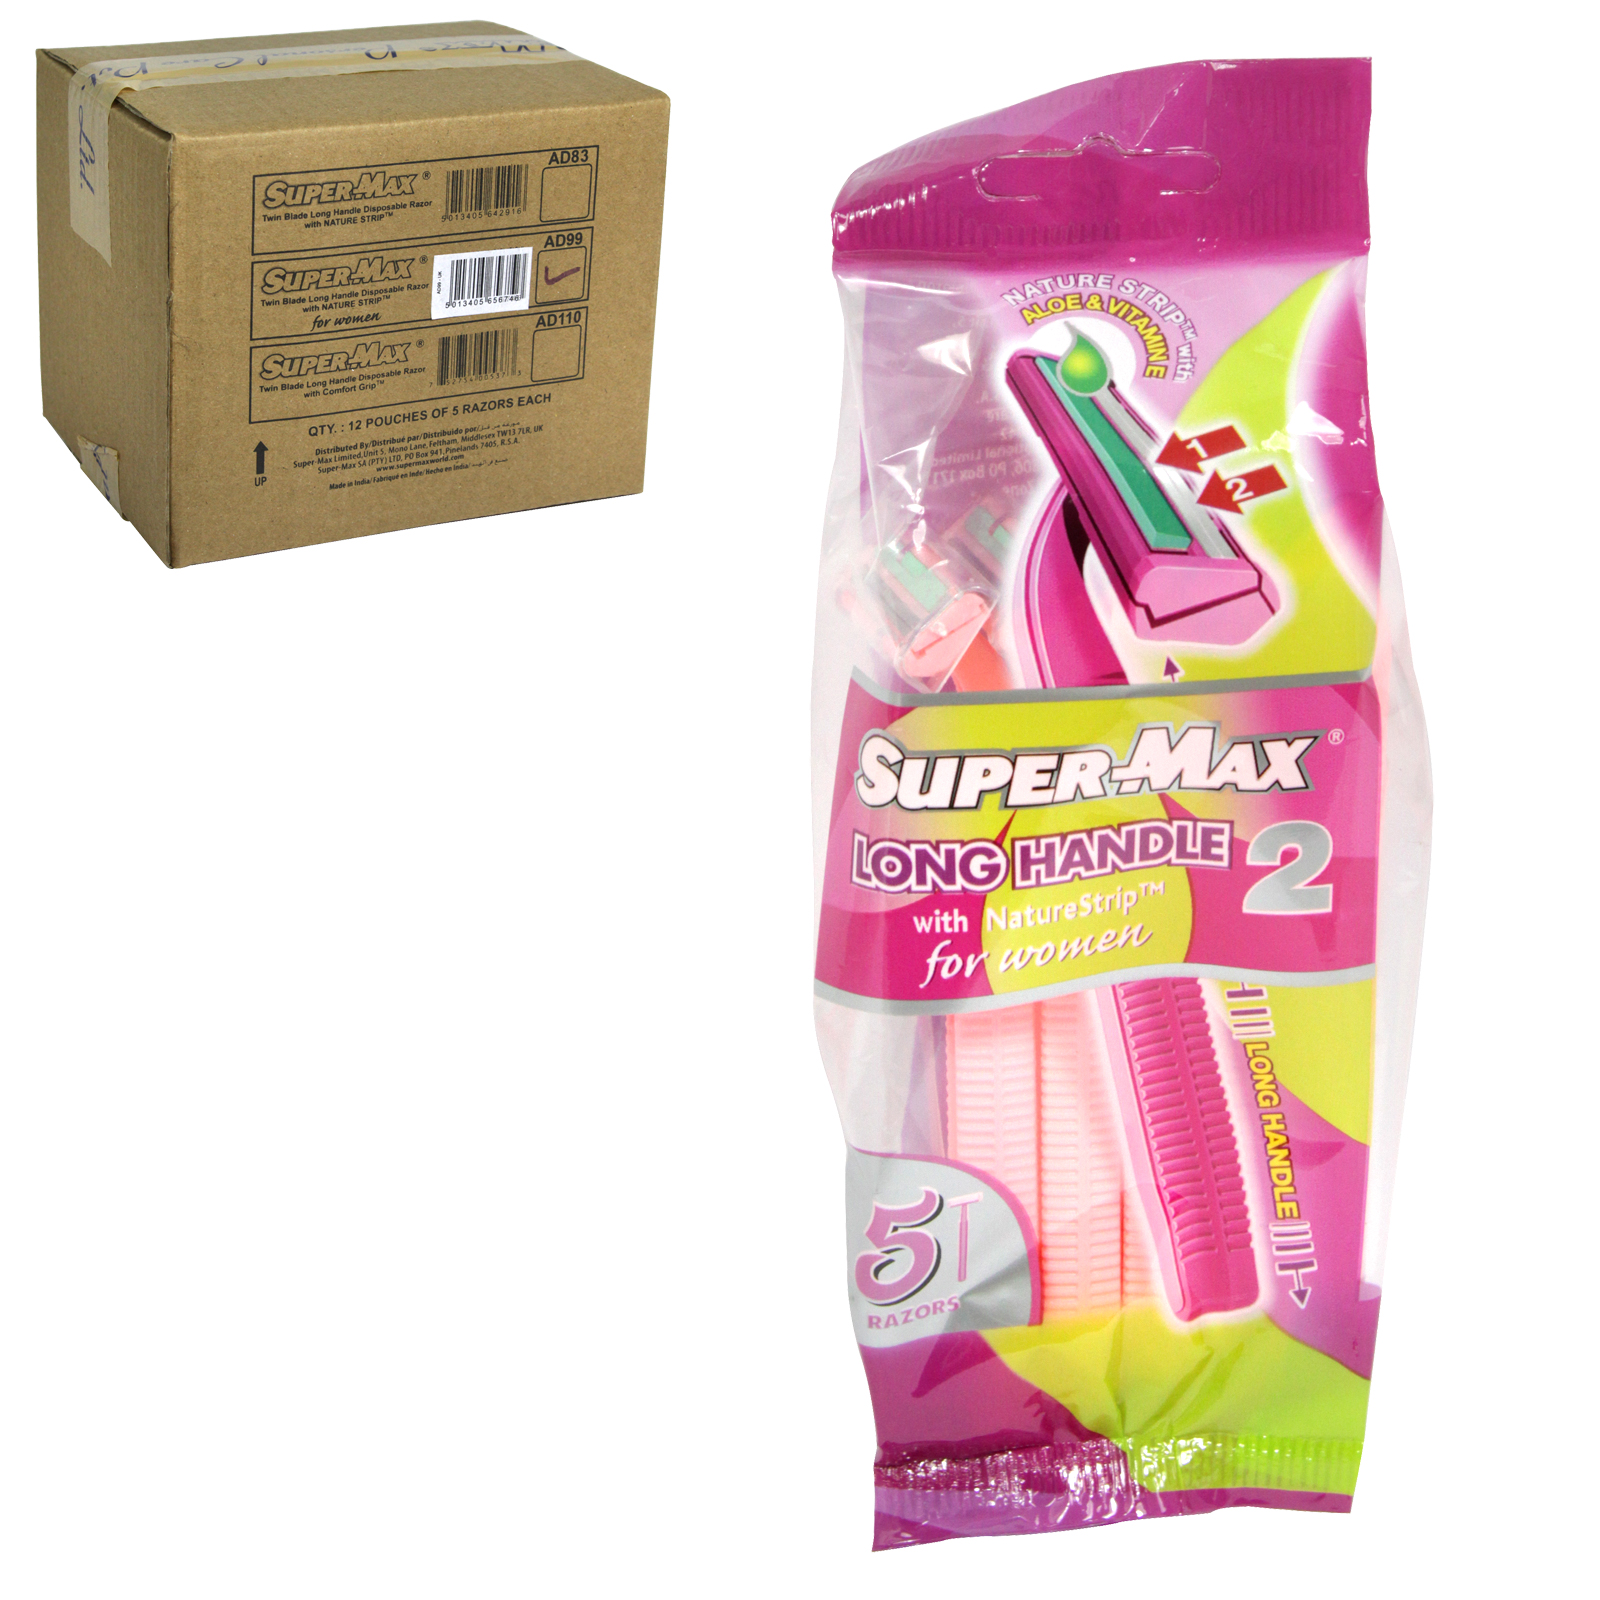 SUPERMAX 5 TWIN BLADE LONG HANDLE DISPOSIBLE RAZOR FOR LADIES X12